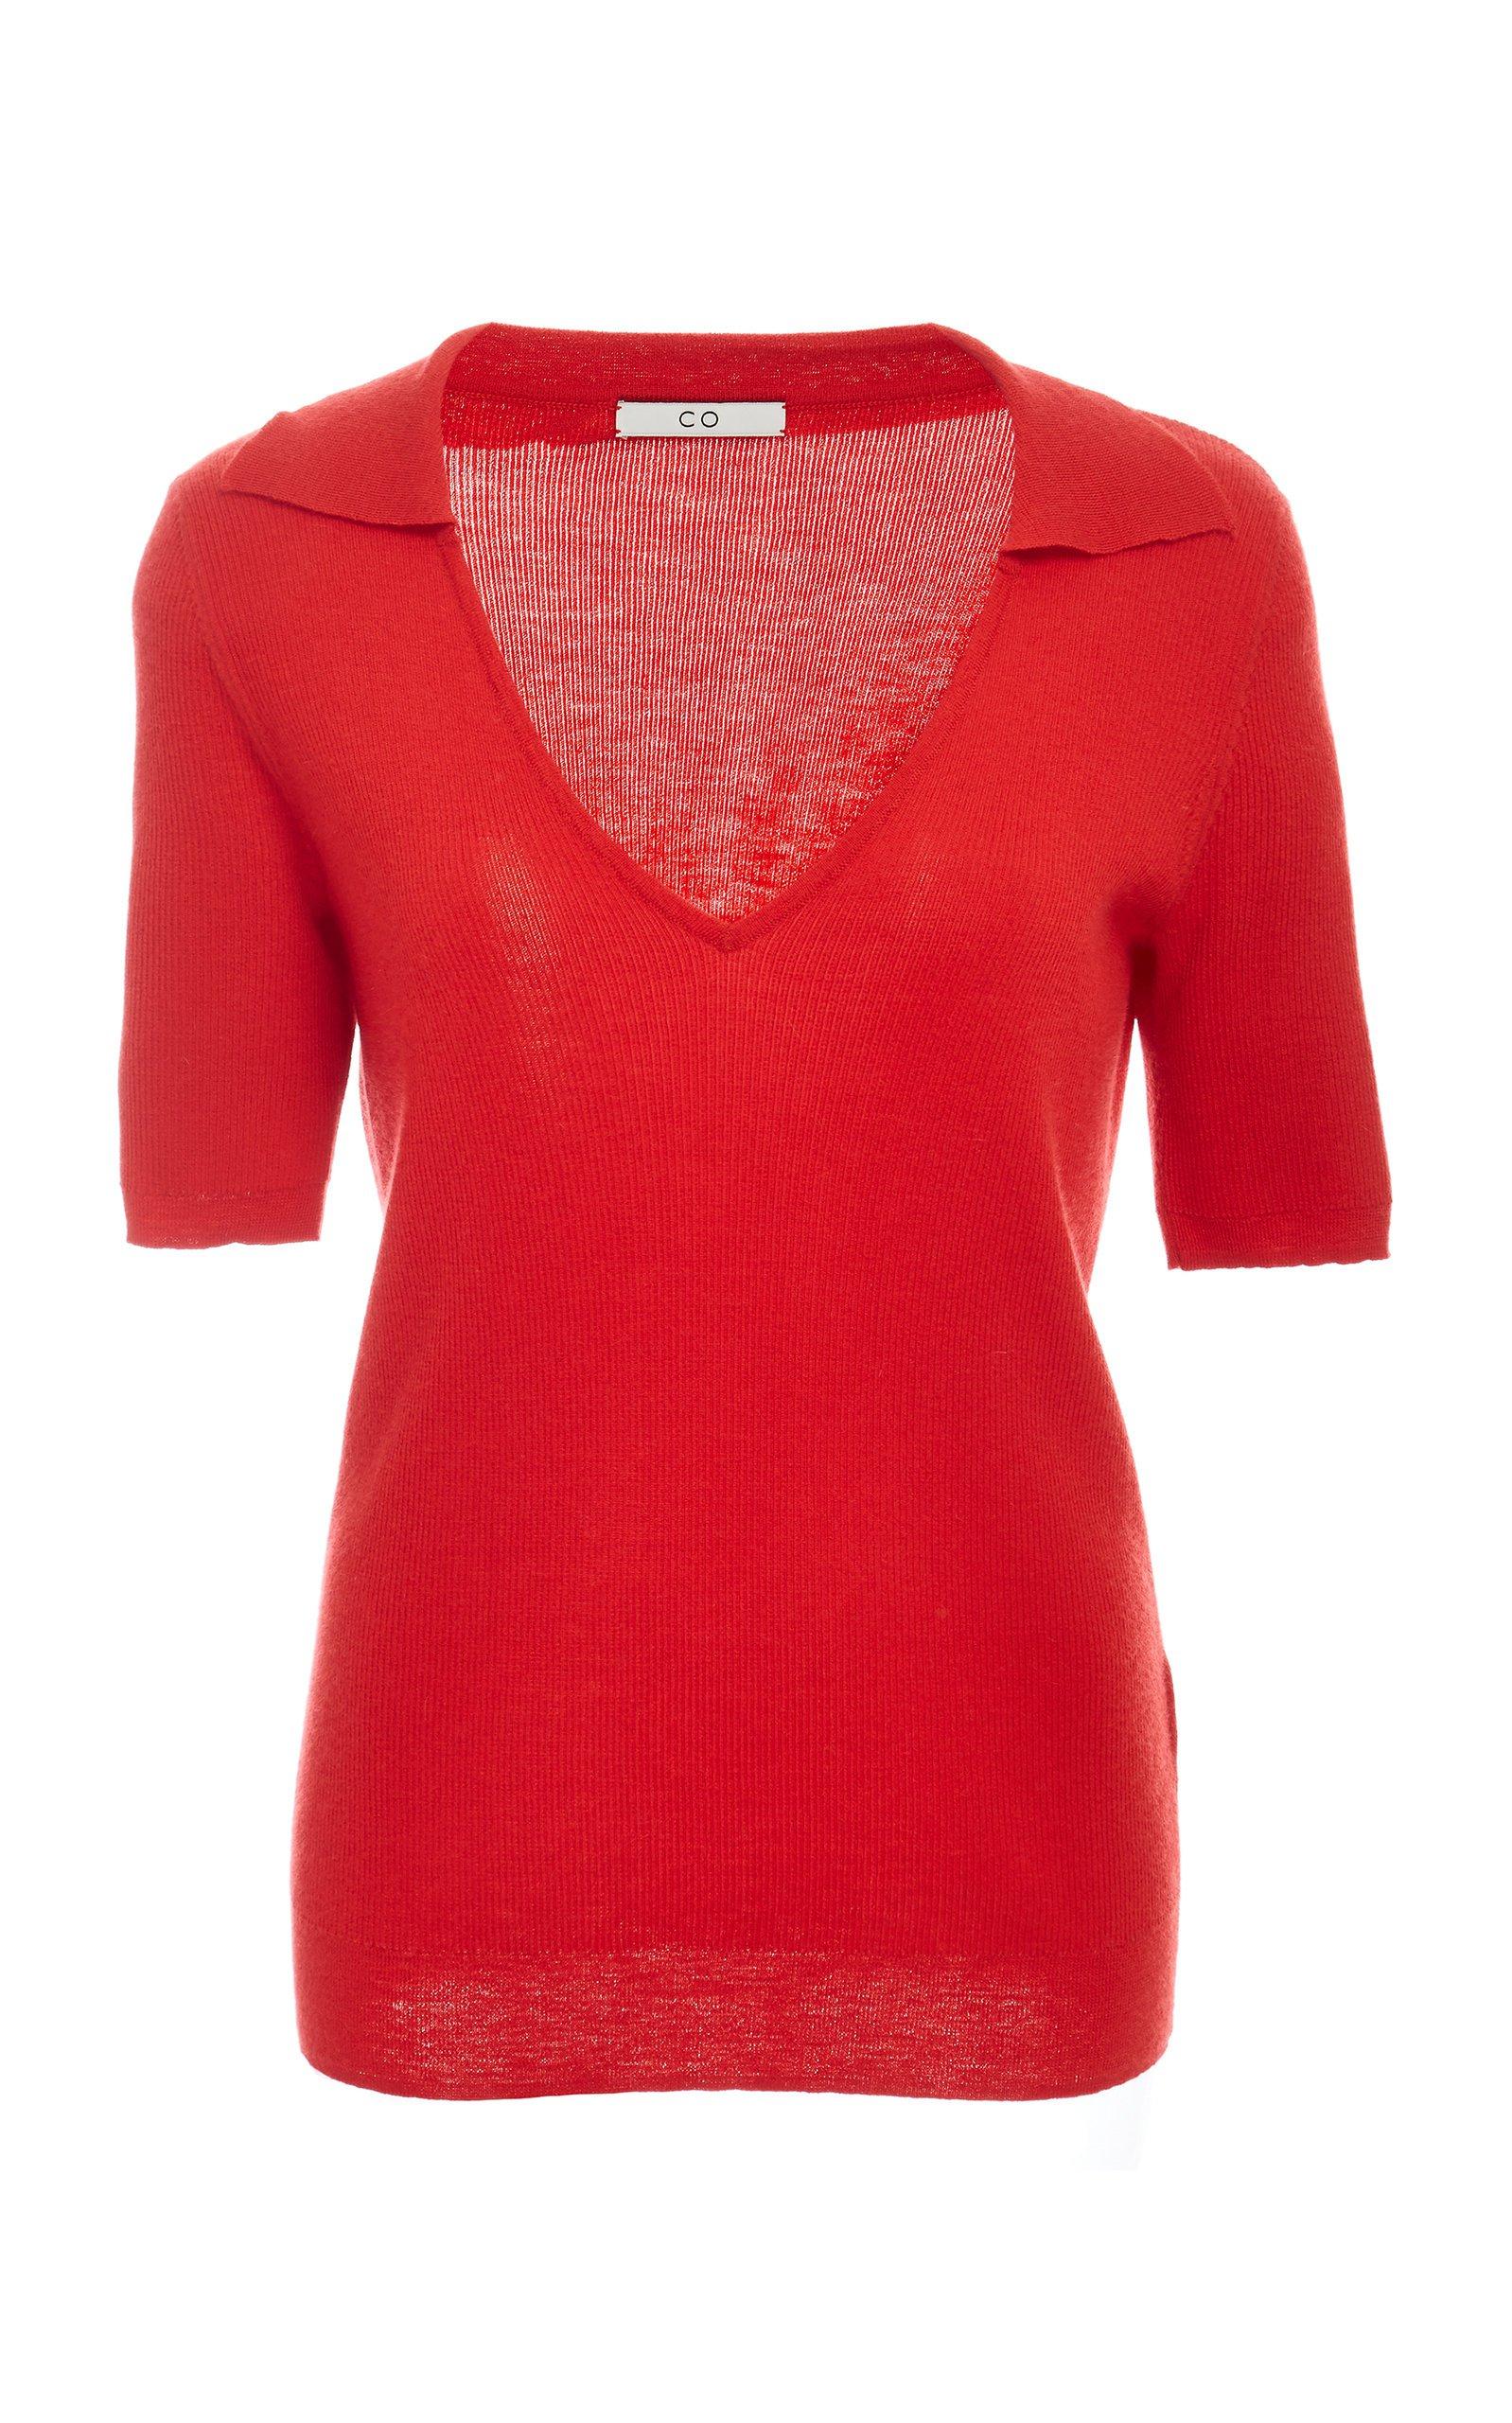 Cashmere Sweater by Co   Moda Operandi